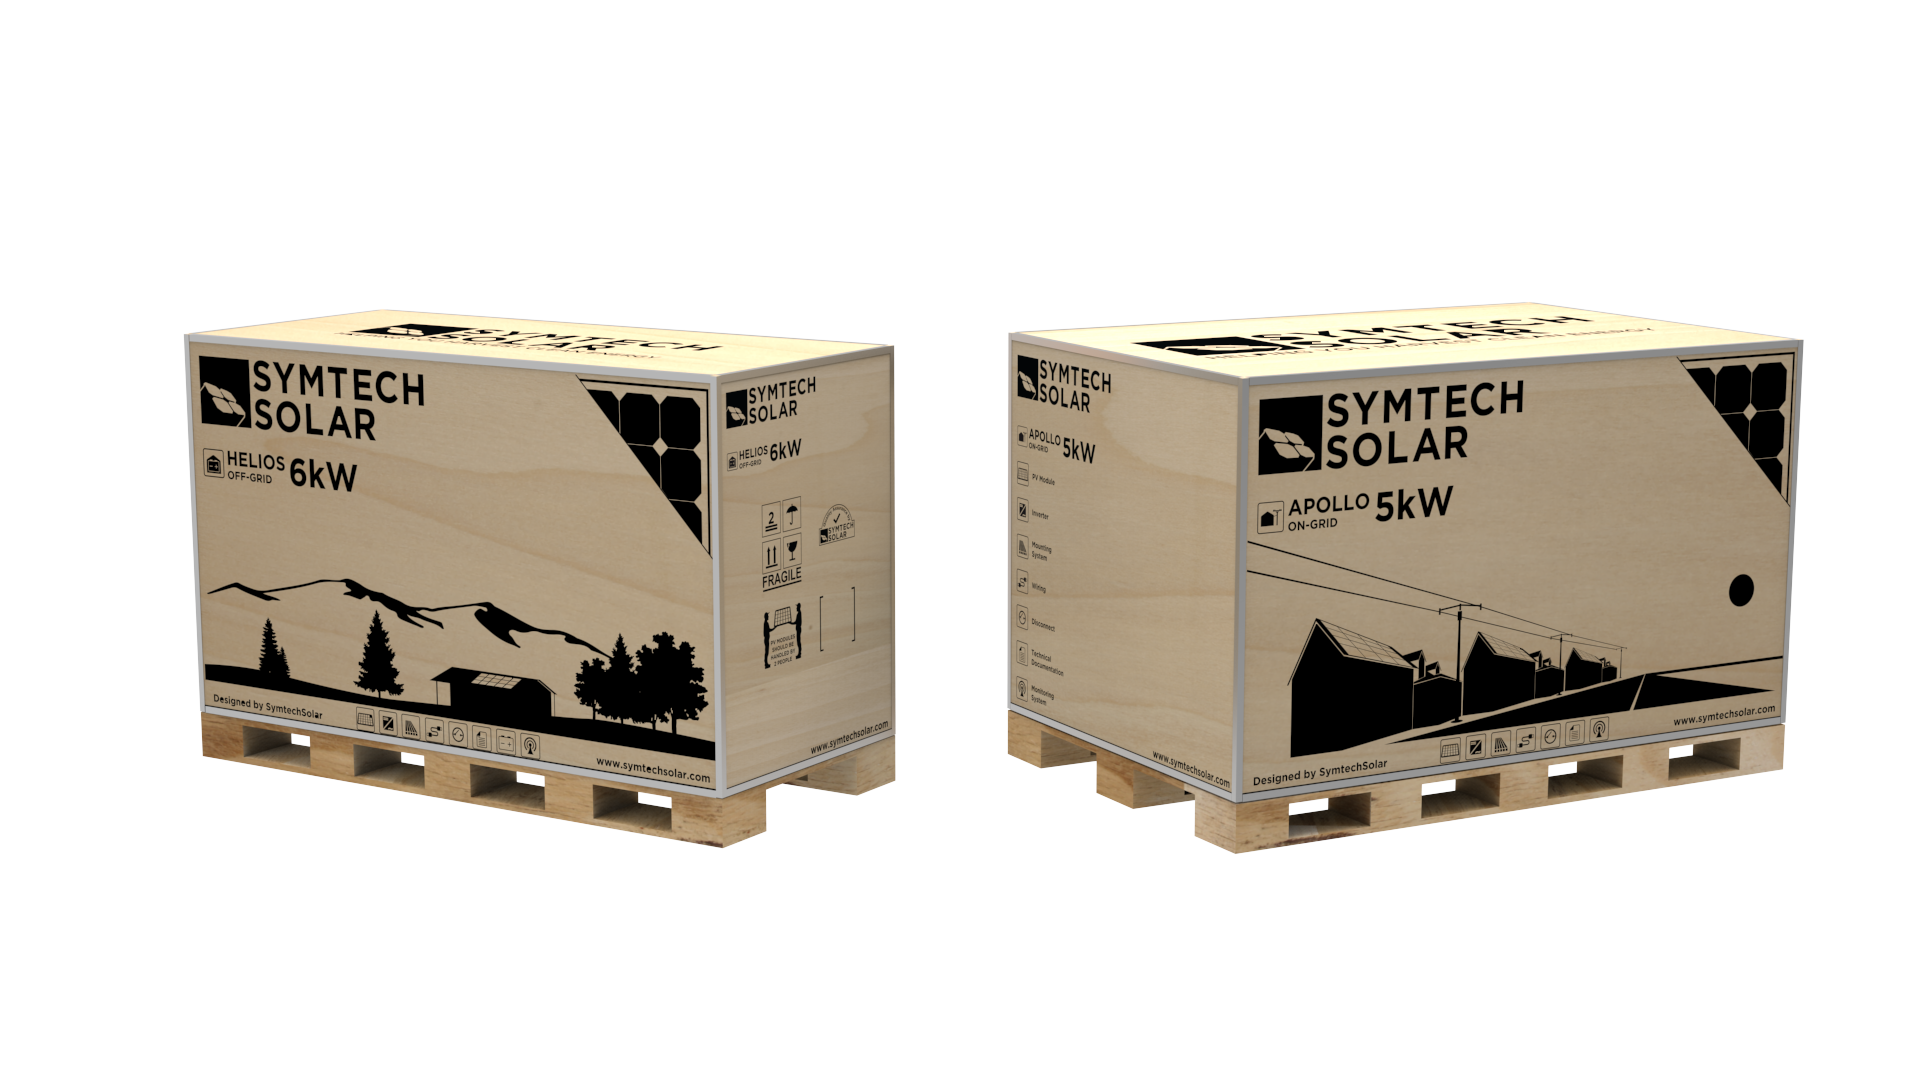 Symtech Solar - Apollo and Helios Boxes